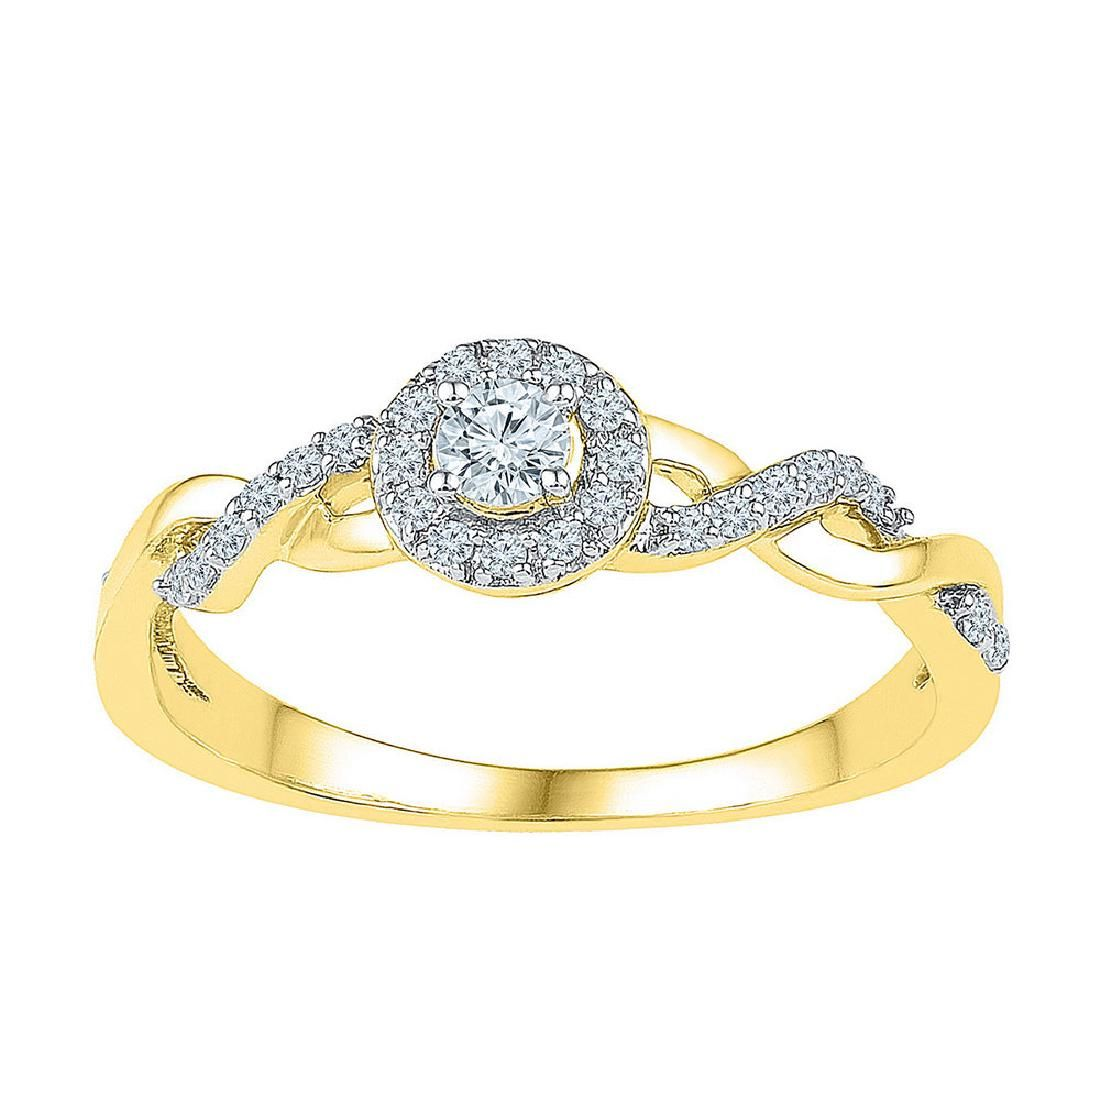 021 CTW Diamond Solitaire Bridal Engagement Ring 10KT